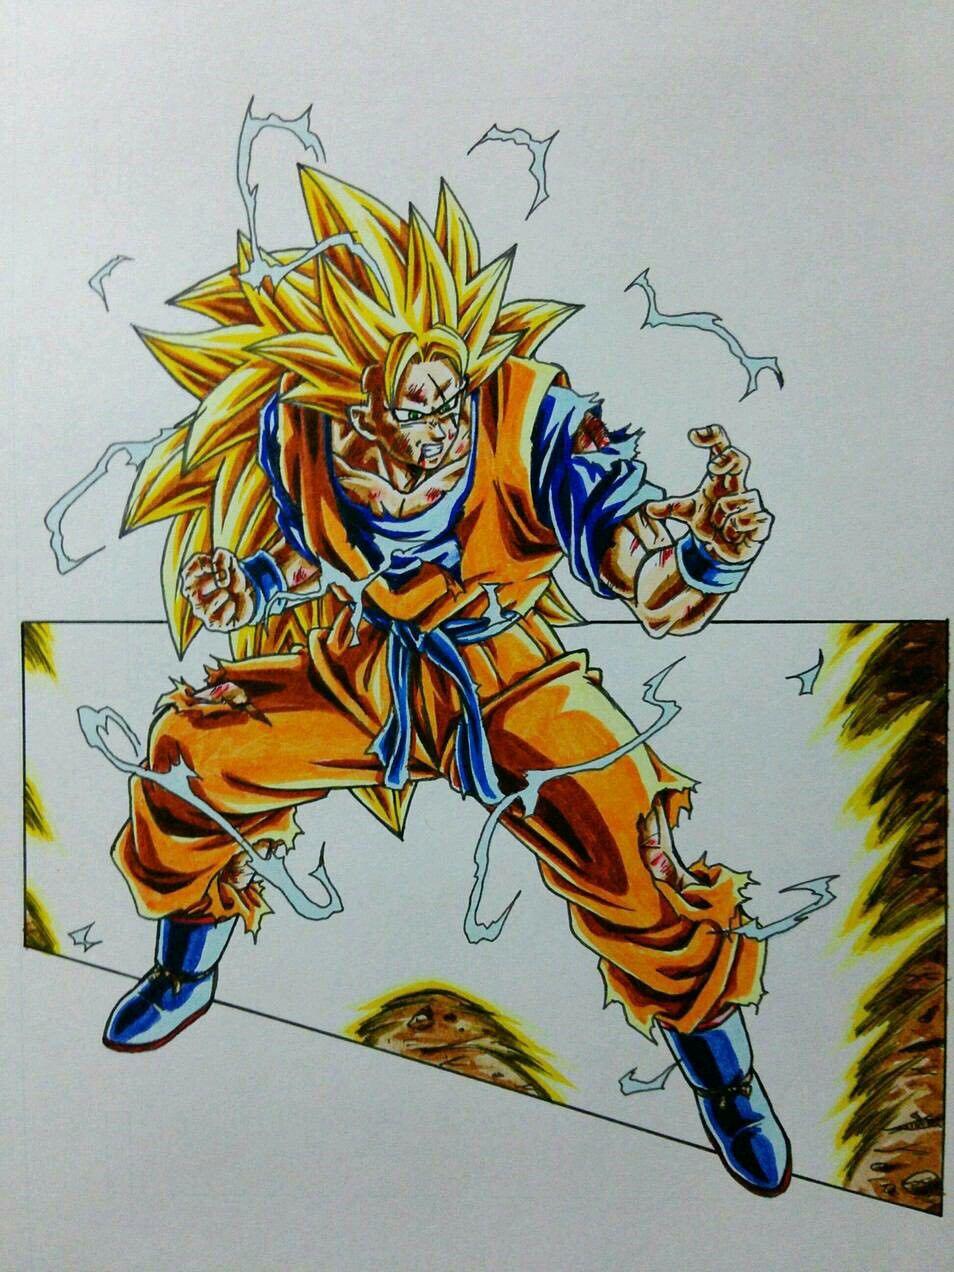 Chibi super saiyan 4 goku random stuffs t dragon ball - Dragon ball gohan super saiyan 4 ...